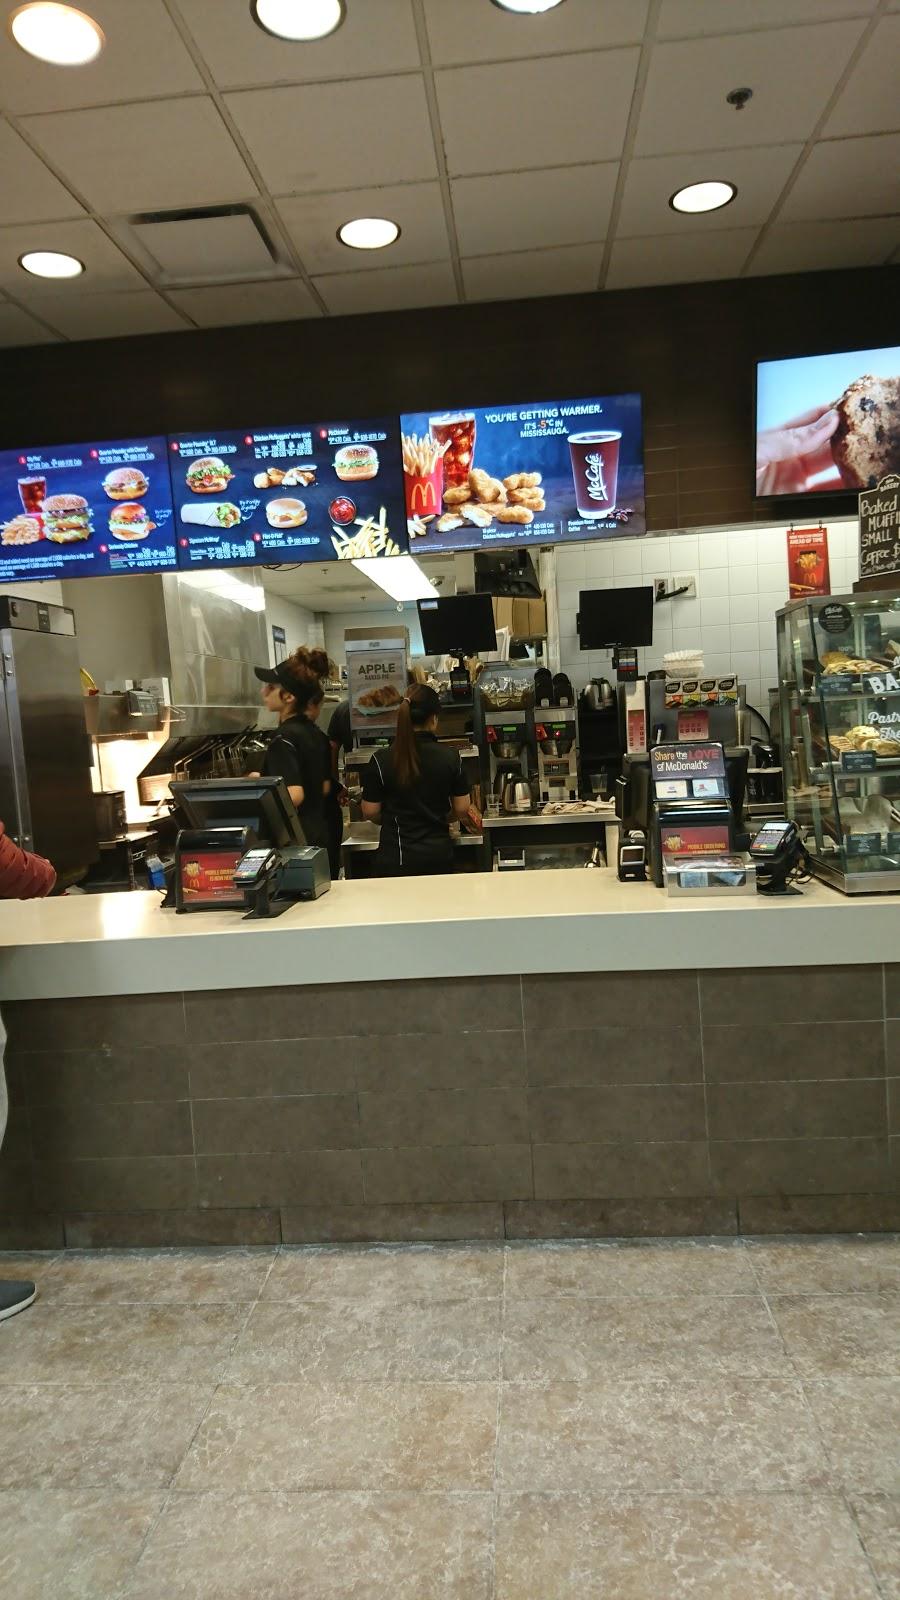 McDonalds | cafe | 1500 Dundas St E, Mississauga, ON L4X 1L4, Canada | 9052702050 OR +1 905-270-2050